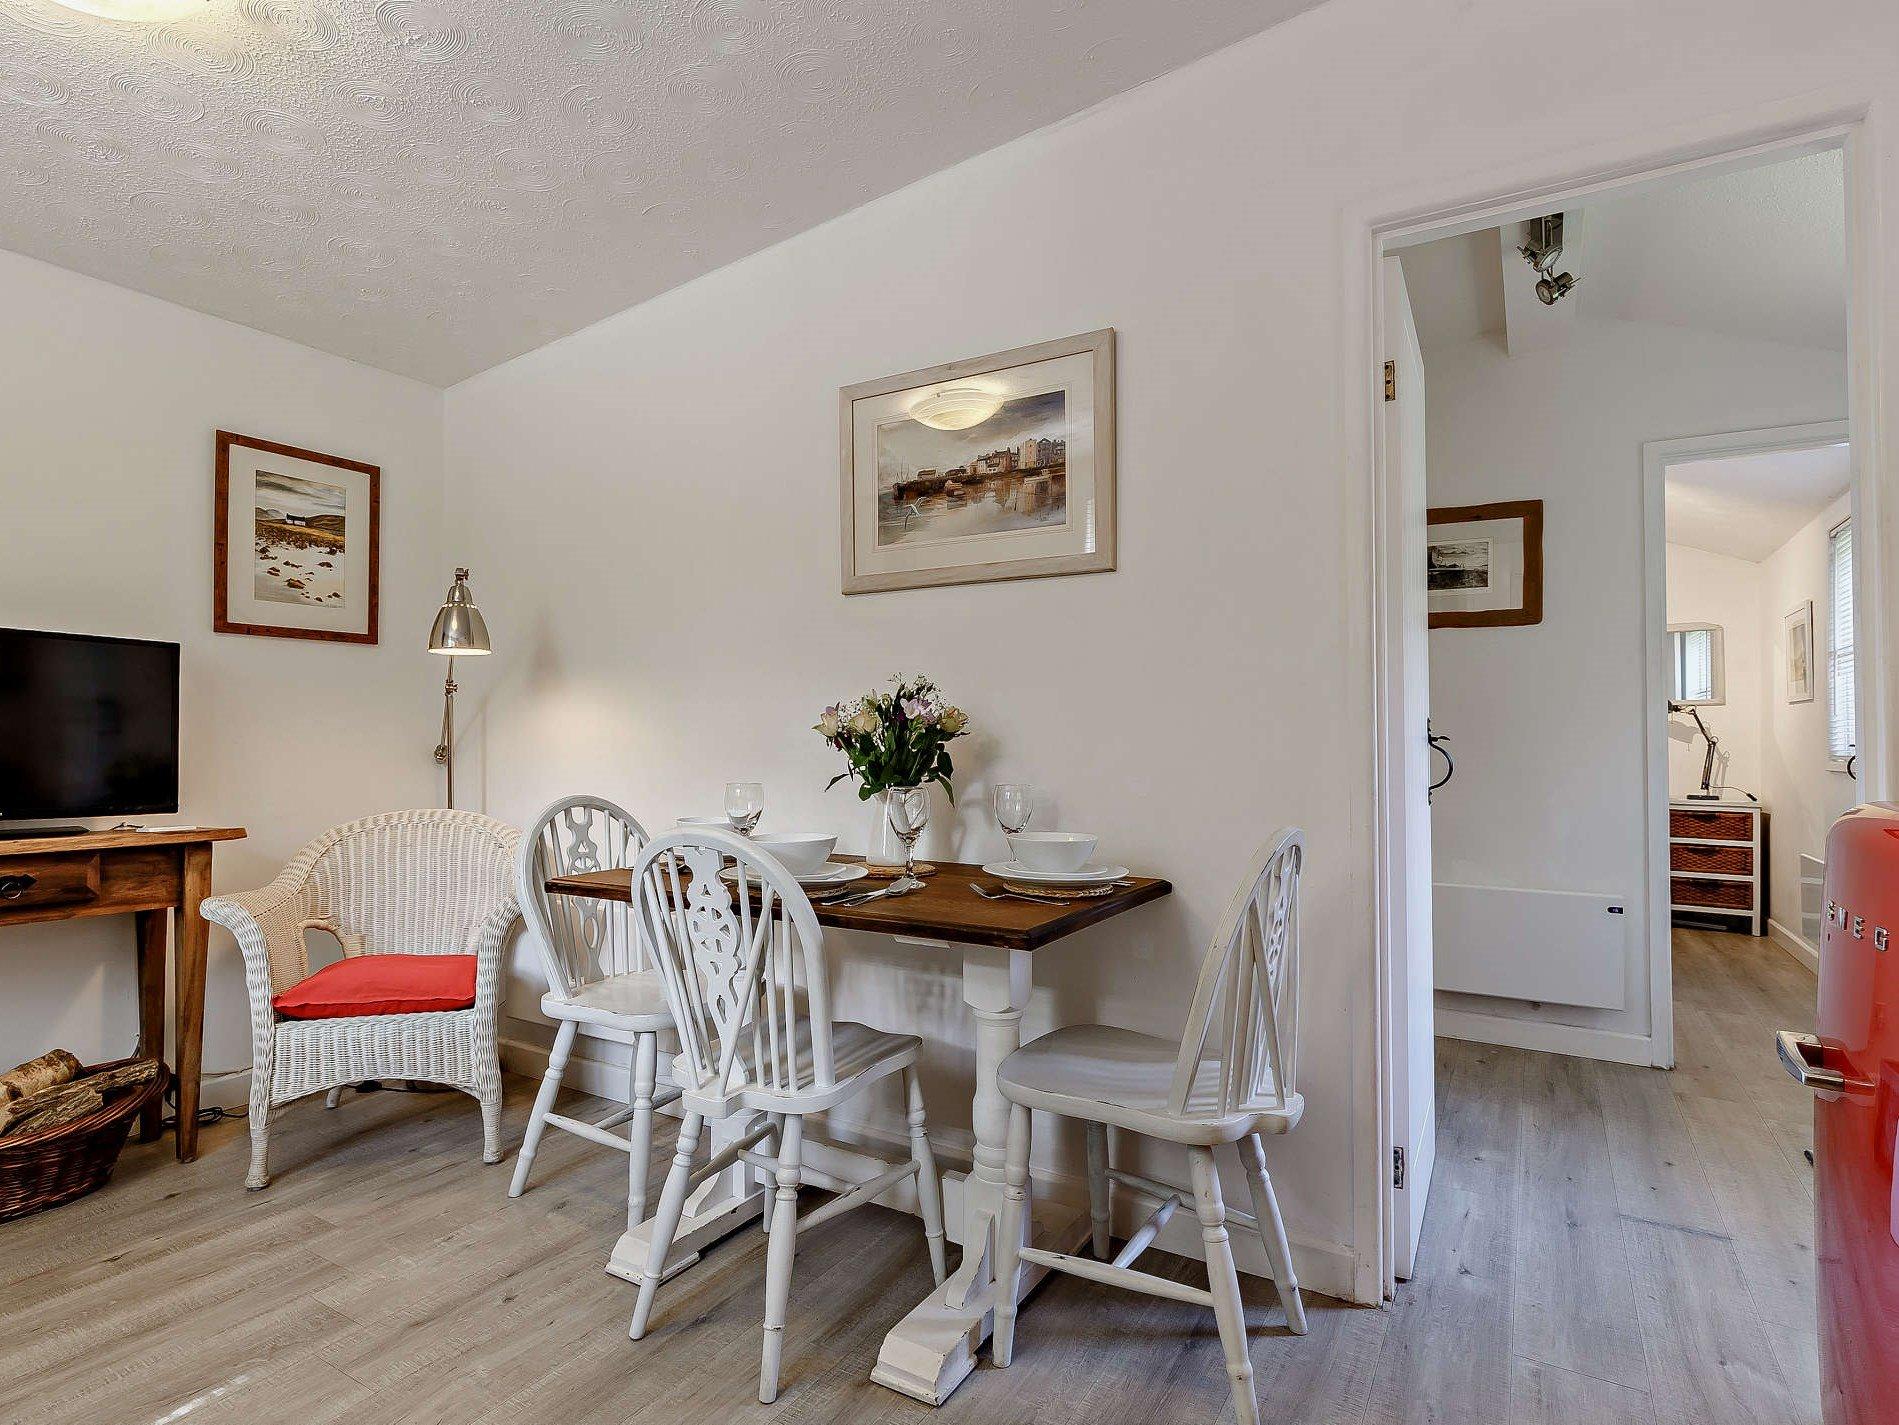 2 Bedroom Bungalow in South Devon, Devon